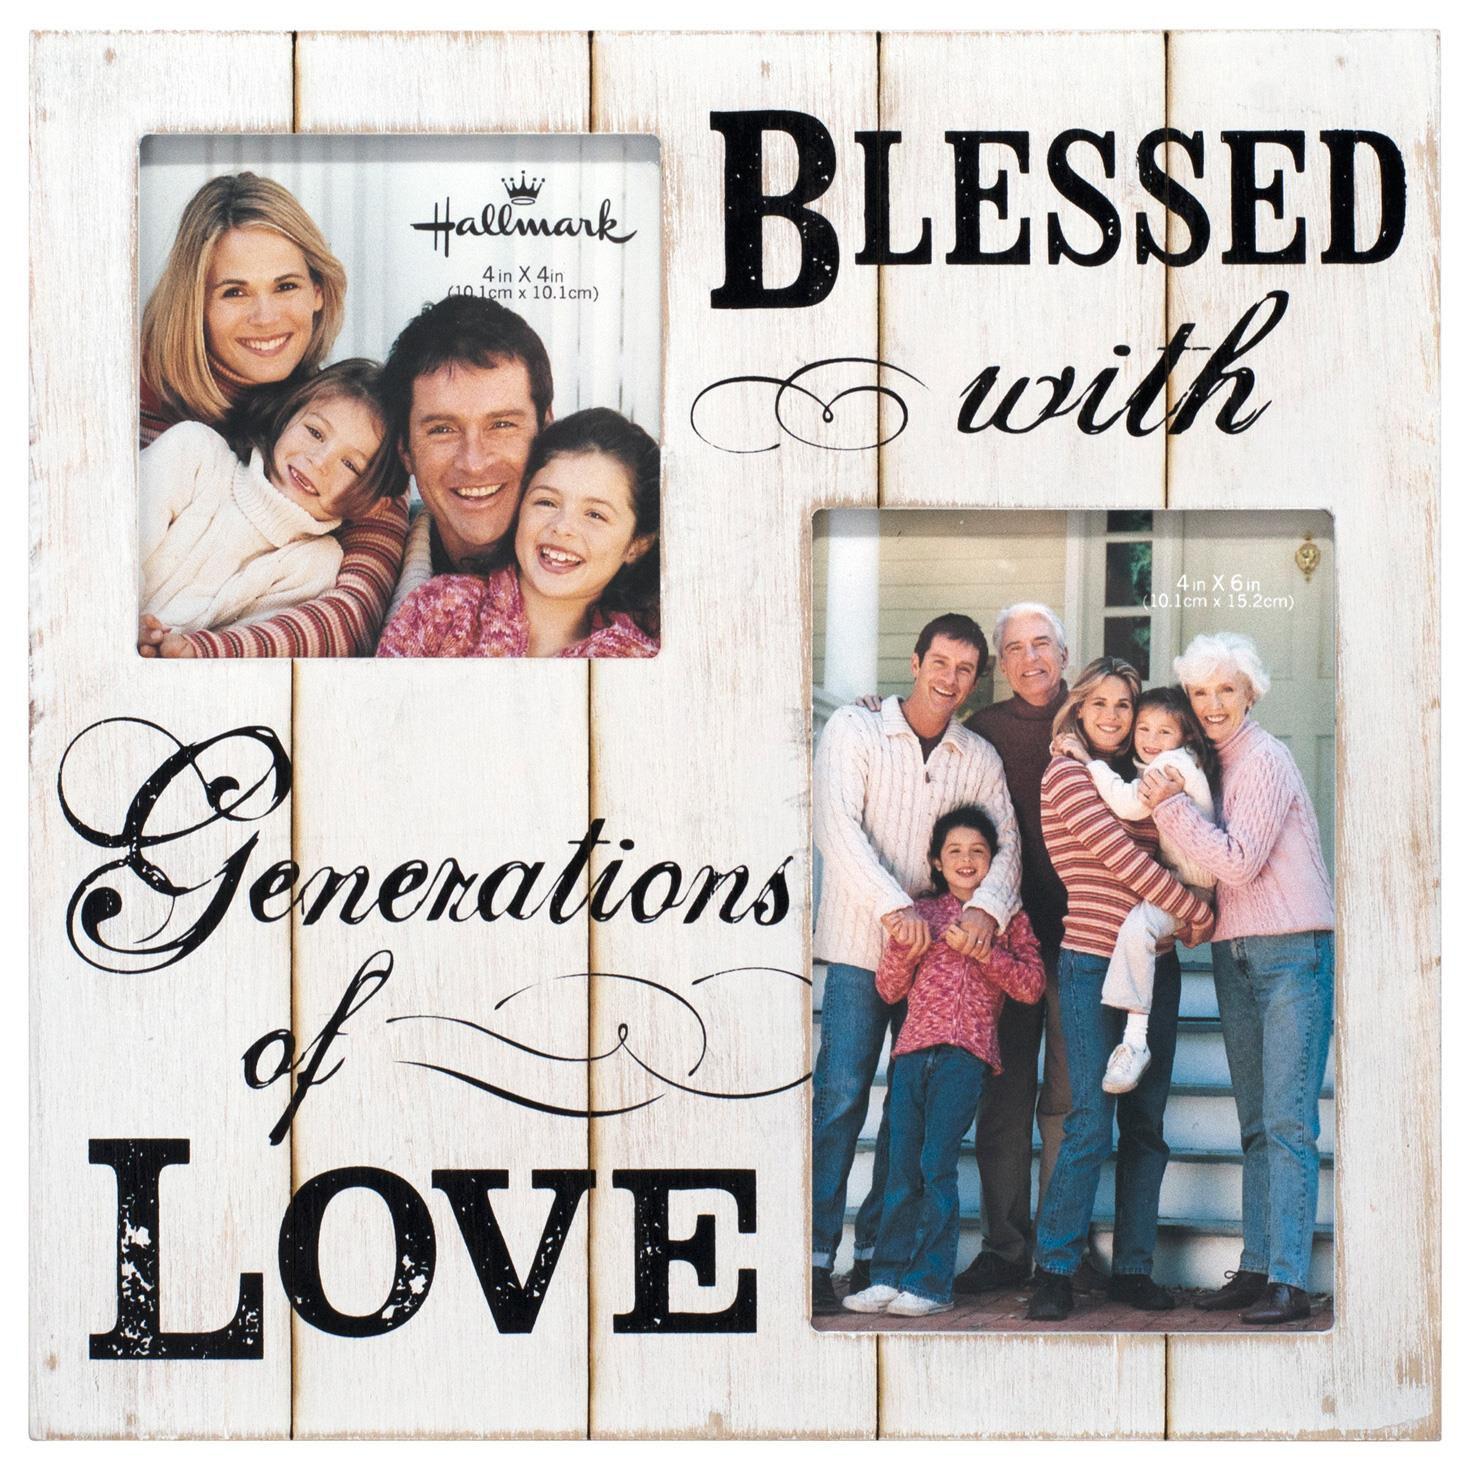 generations of love wood photo frame 4x4 u0026 4x6